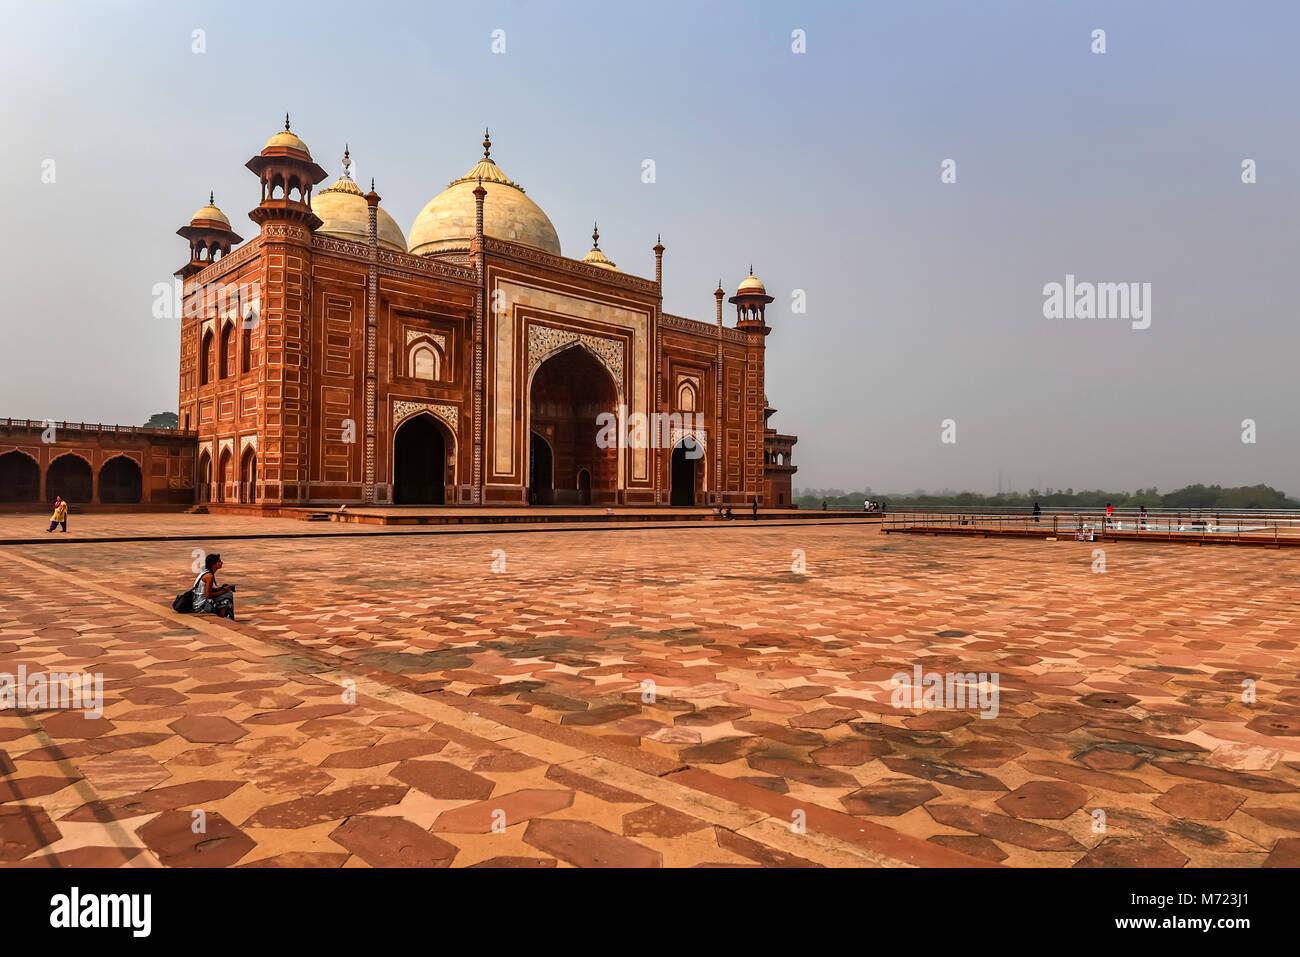 AGRA, INDIA - Noviembre 8, 2017: Vista de la mezquita de Taj-Mahal Imagen De Stock